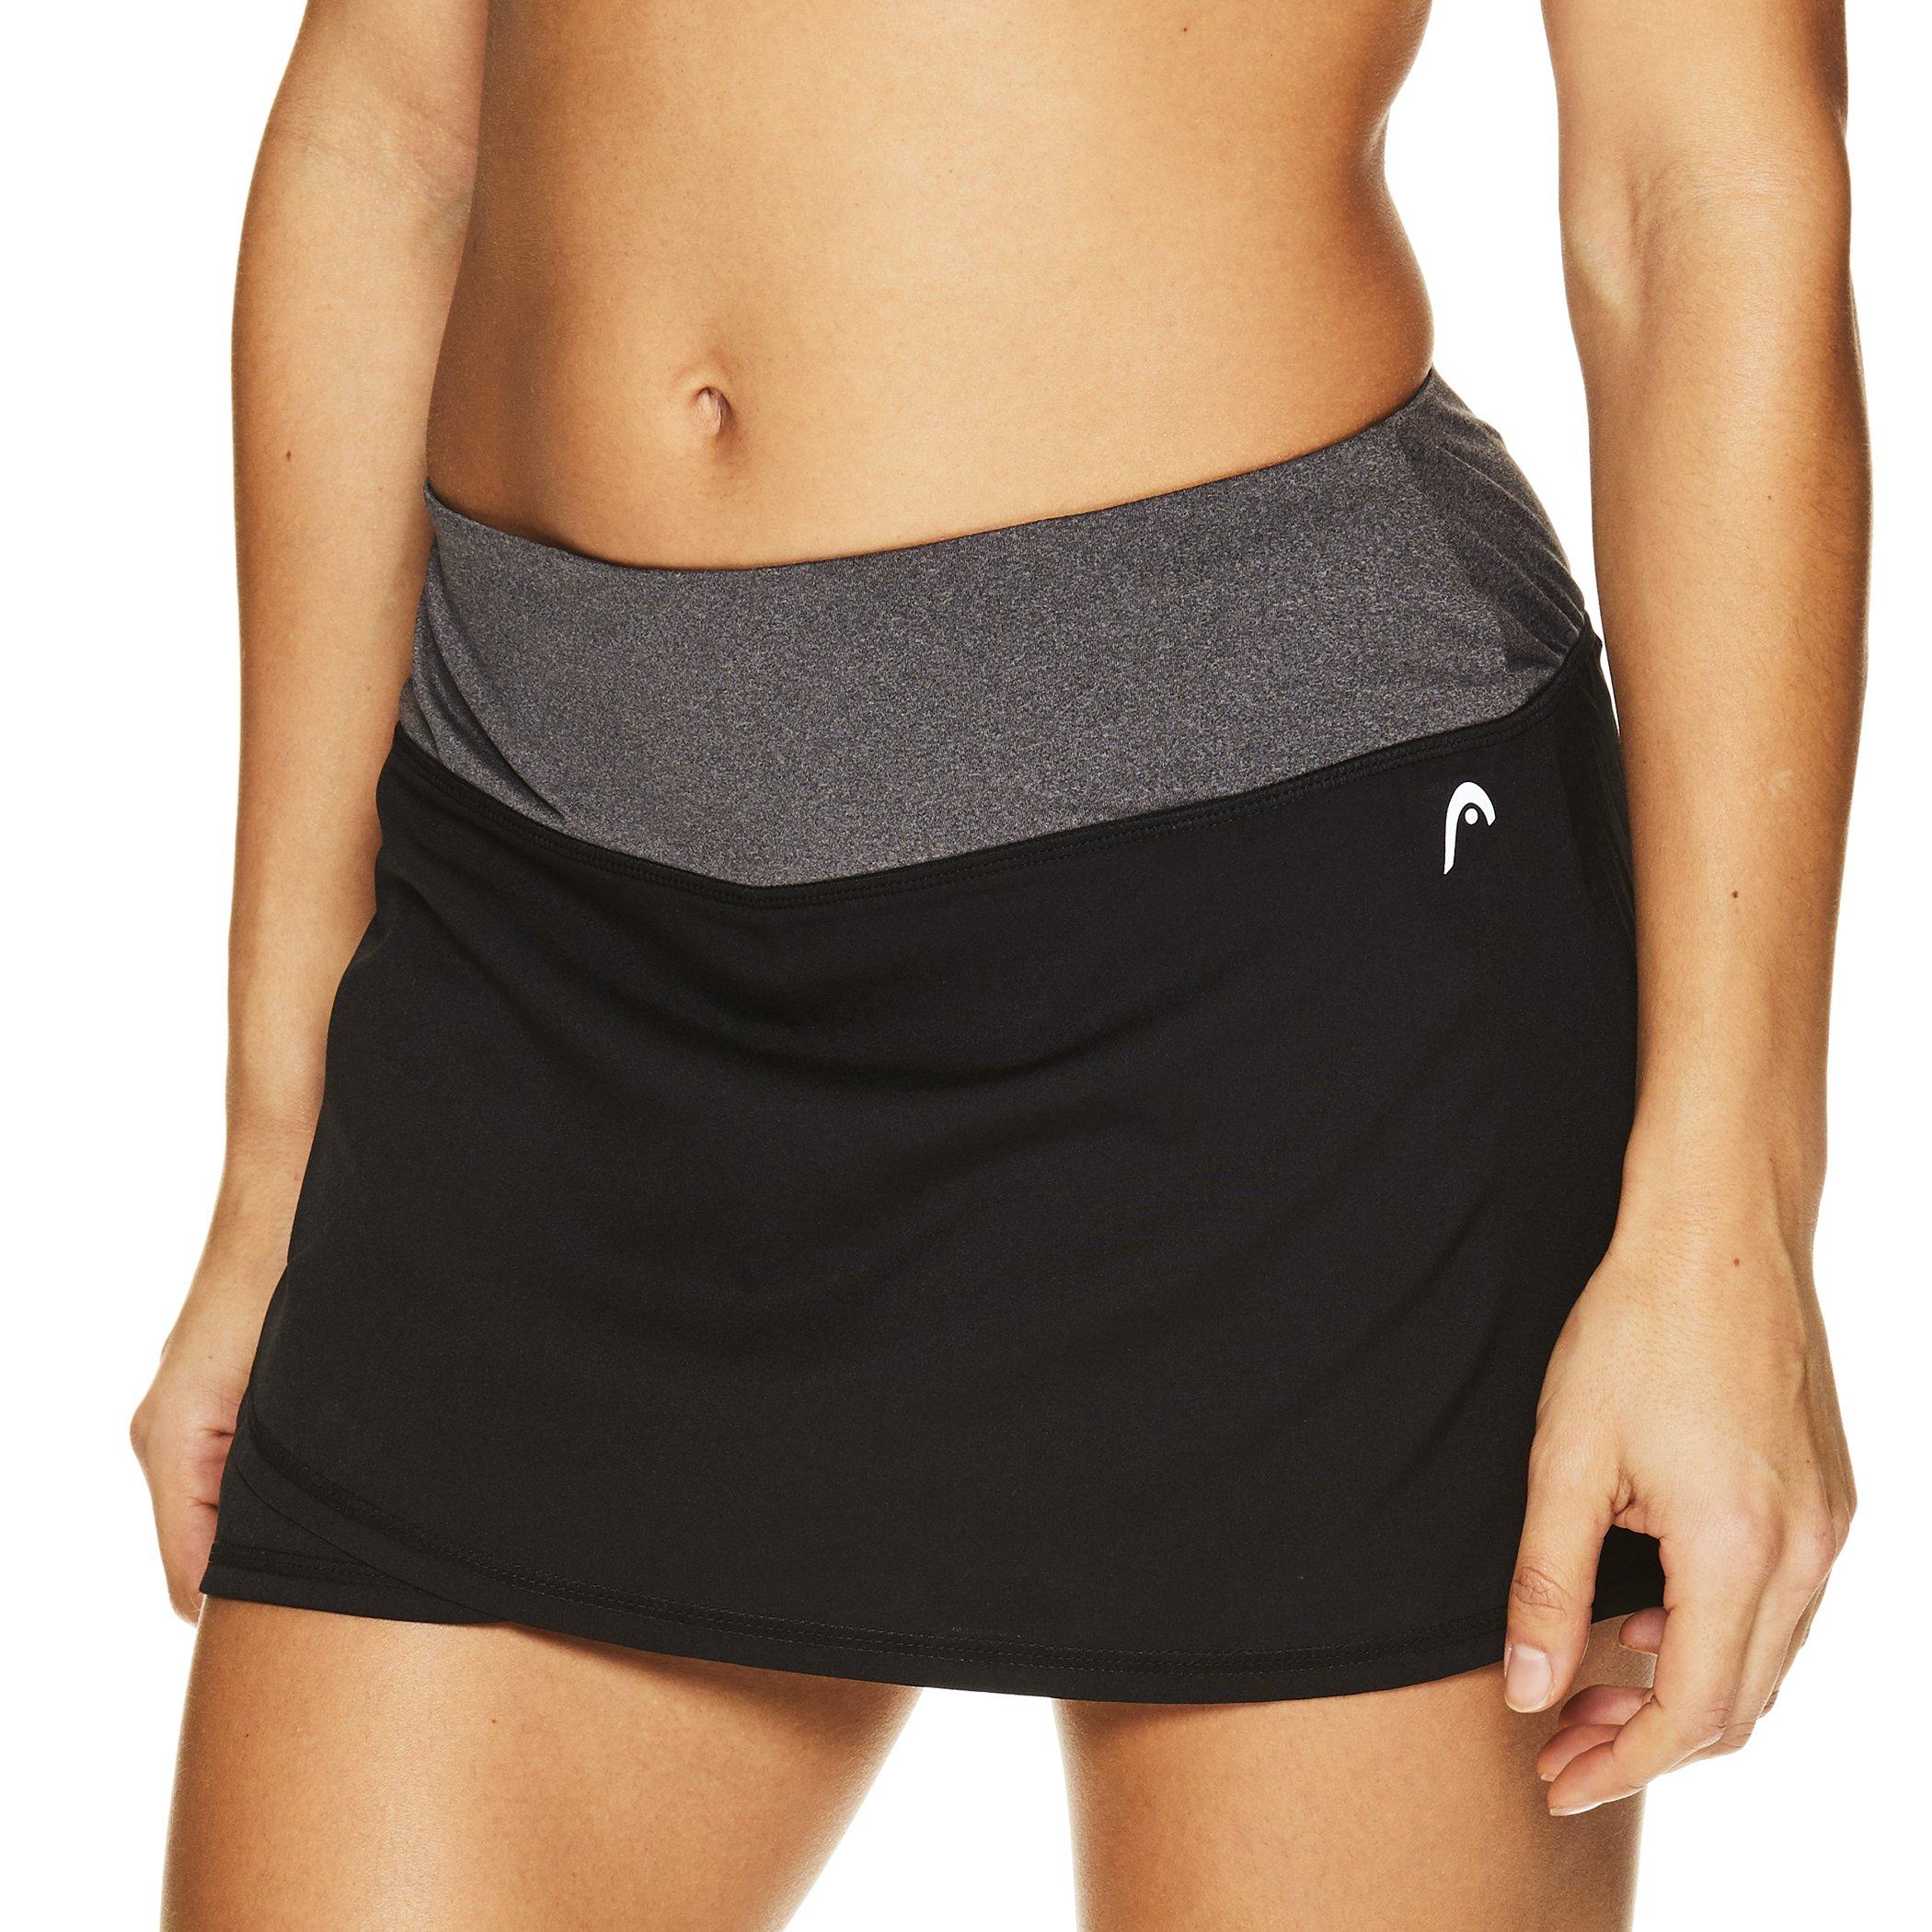 HEAD Women's Athletic Tennis Skort - Performance Training & Running Skirt - Black Rally, Large